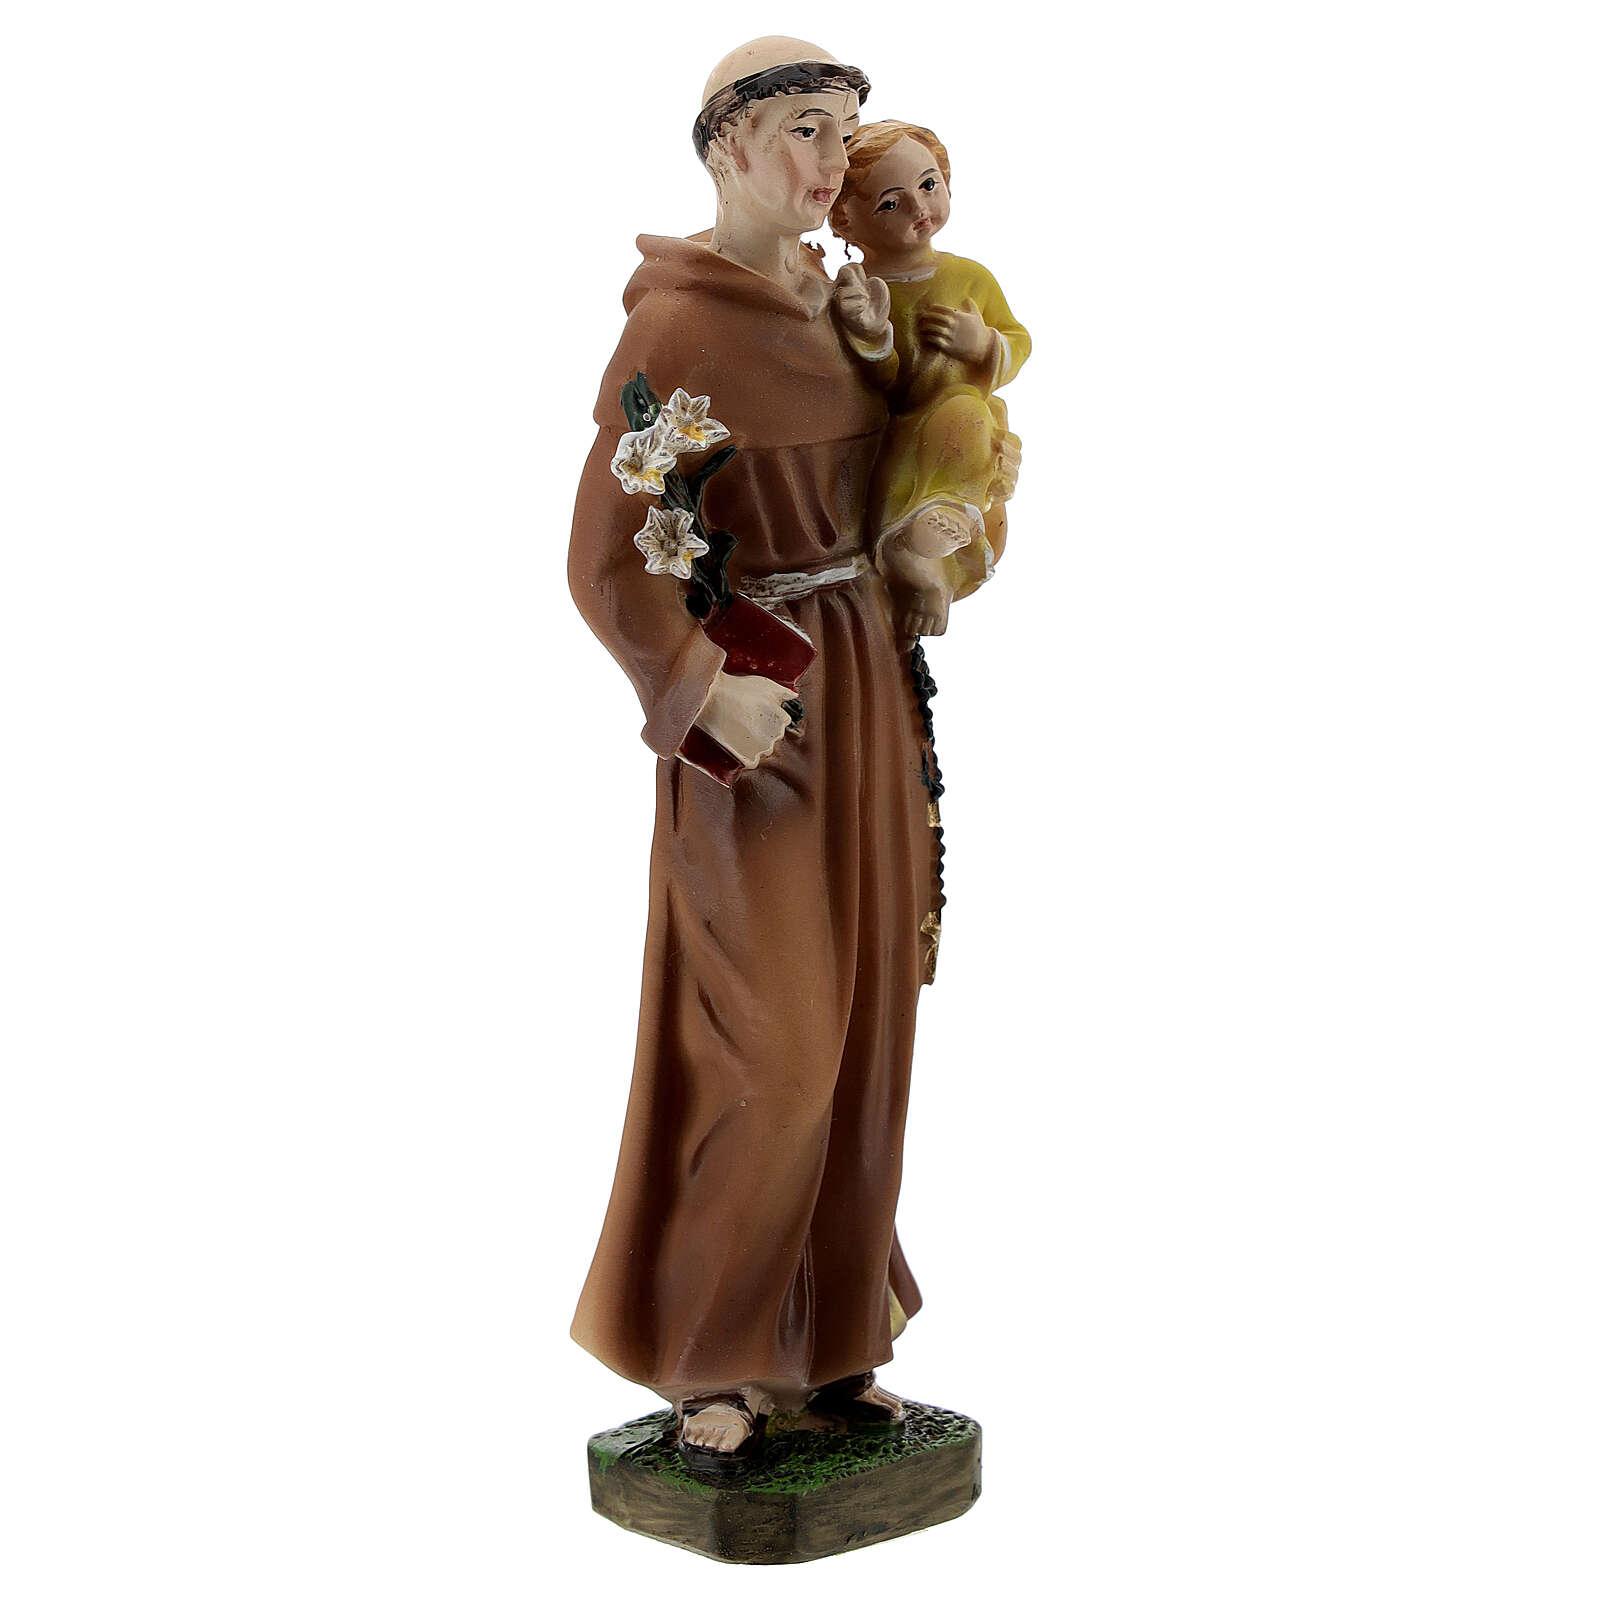 St Anthony statue with Child Jesus yellow dress, 12 cm 4